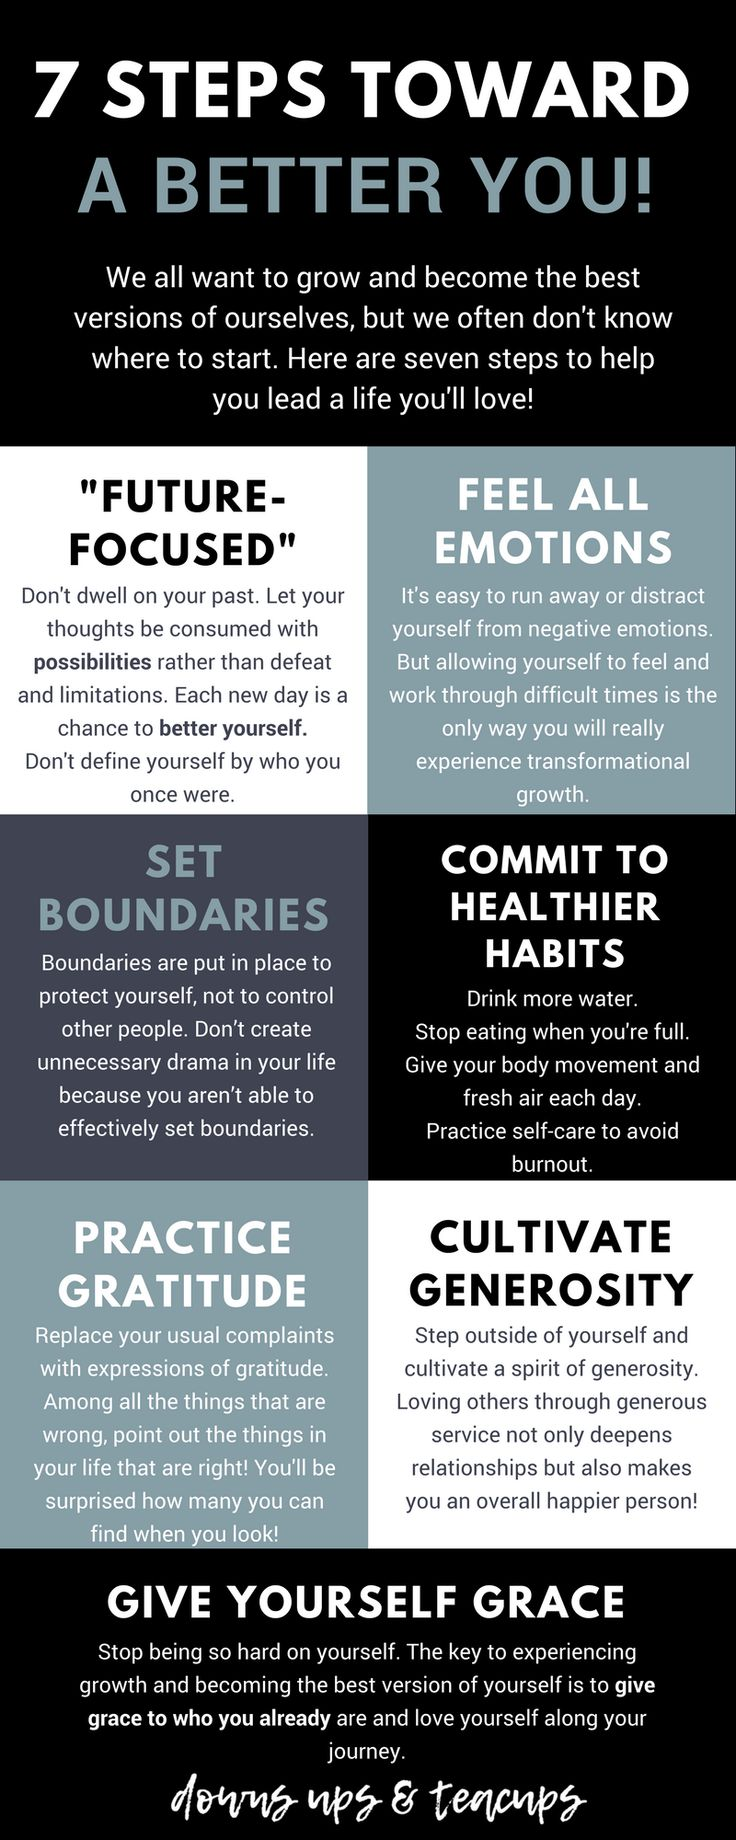 7 Steps Toward A Better You